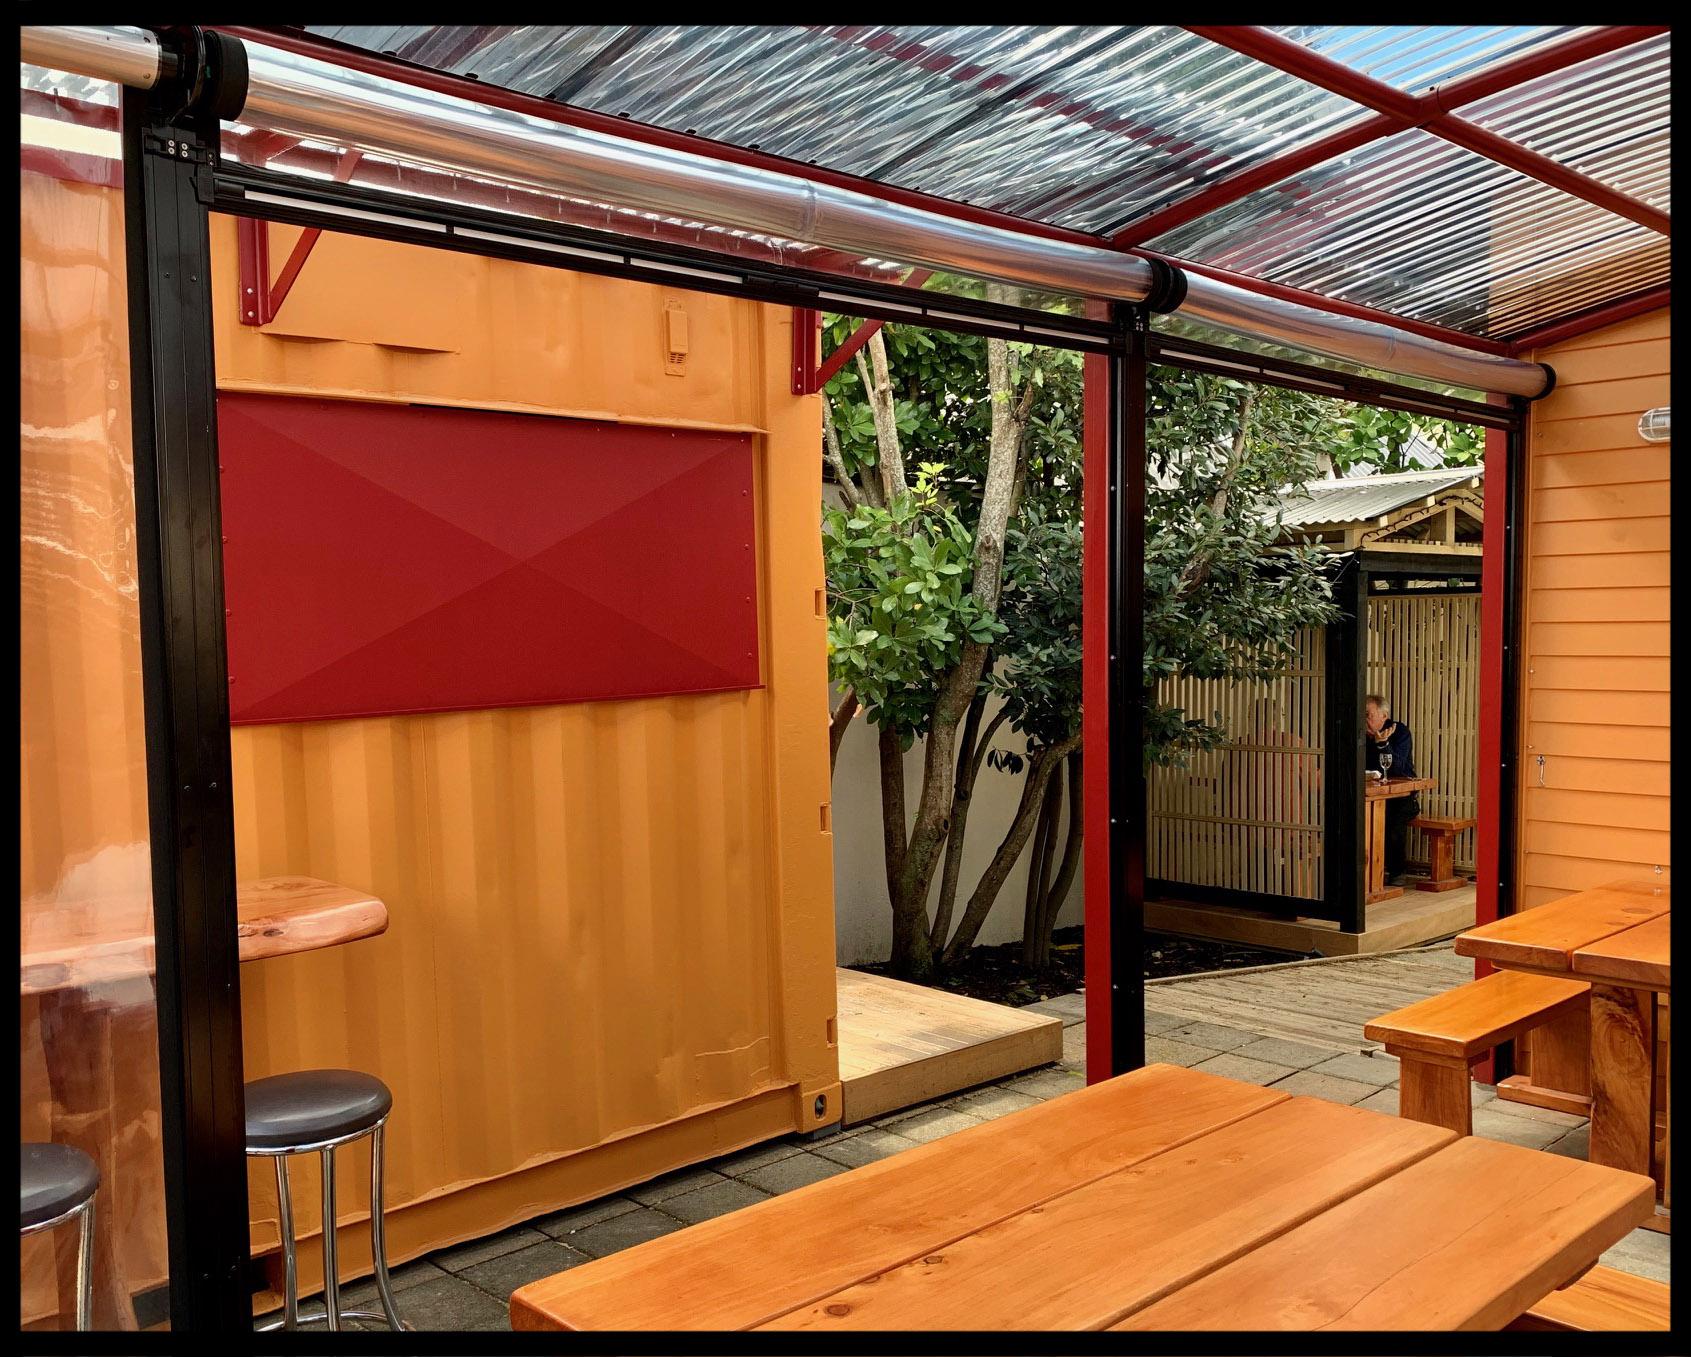 Clear Ziptraks, The Indian Cafe, Nelson